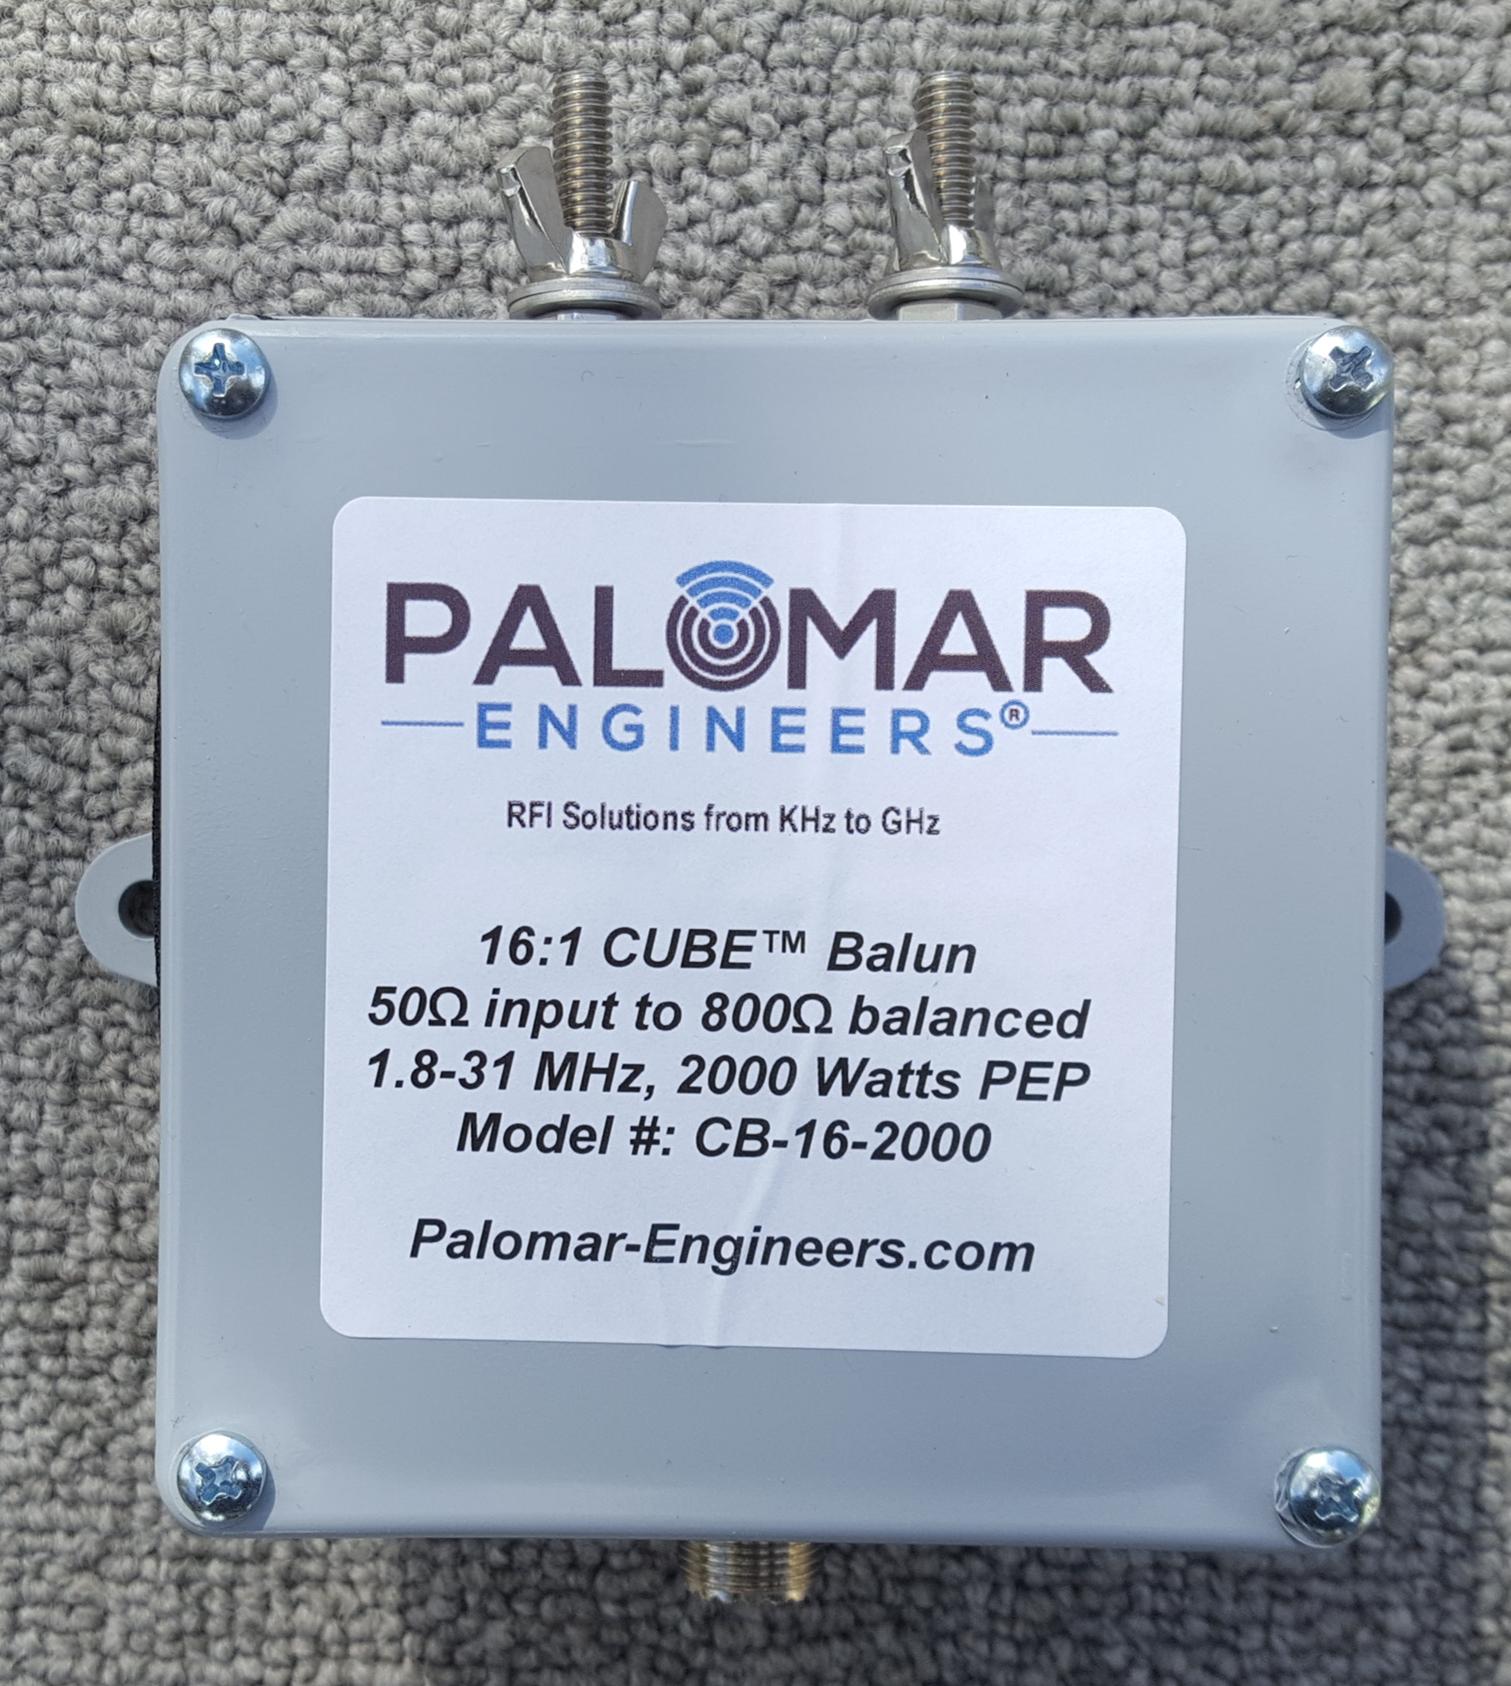 50:800 ohm (16:1) CUBE™ Balun, 1-31 MHz, 1KW/2KW PEP CB-16-2000